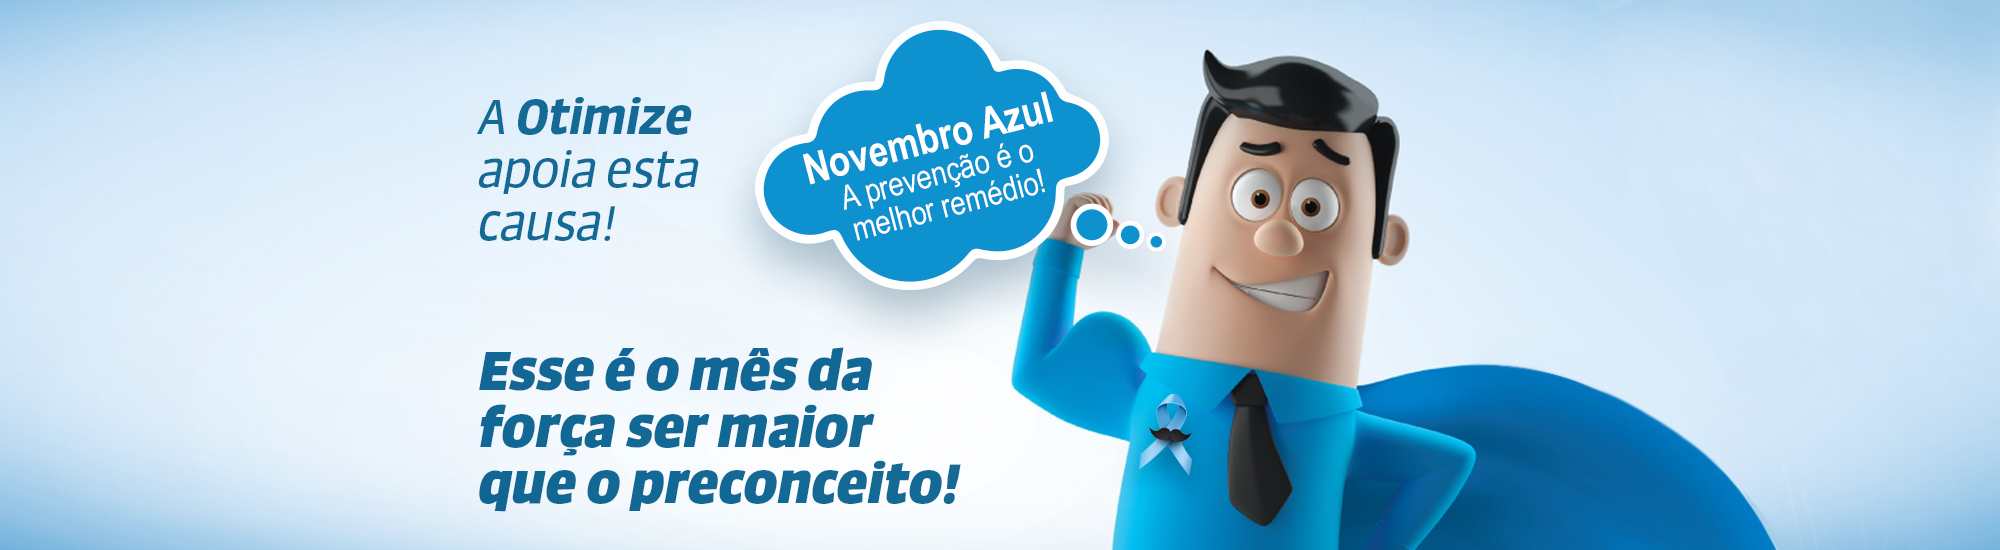 banner site OTIMIZE Novembro Azul.